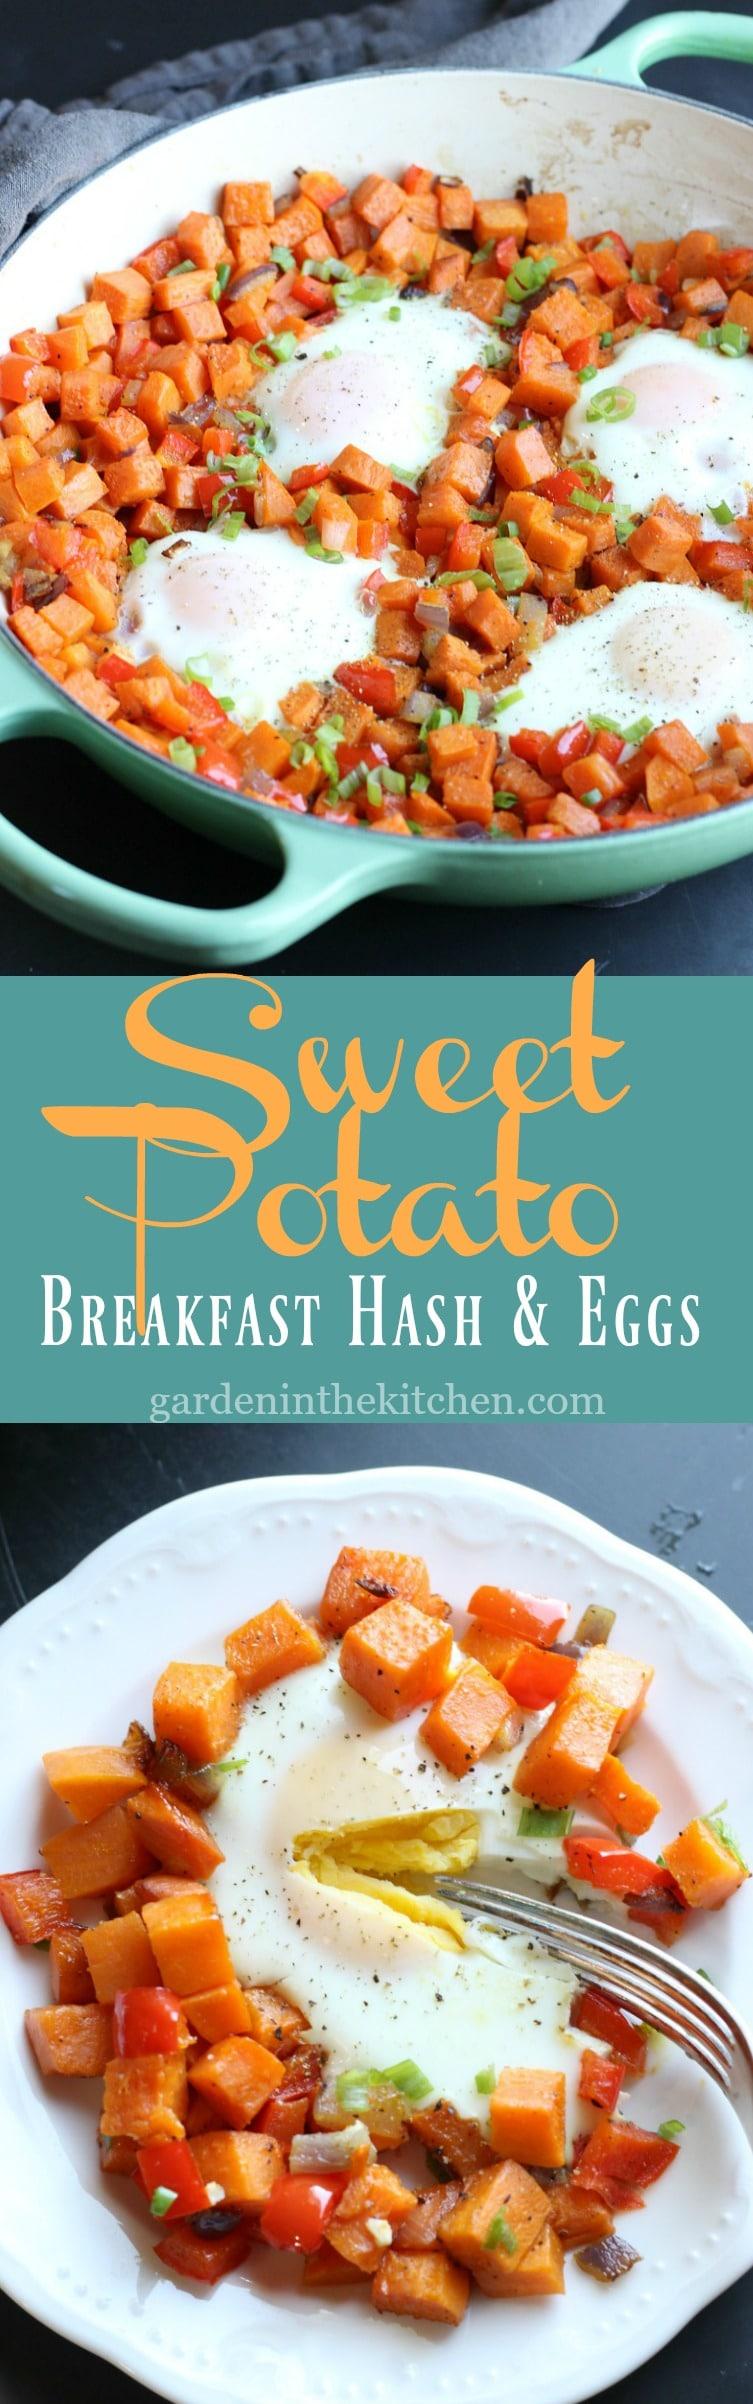 Sweet Potato Breakfast Hash & Eggs